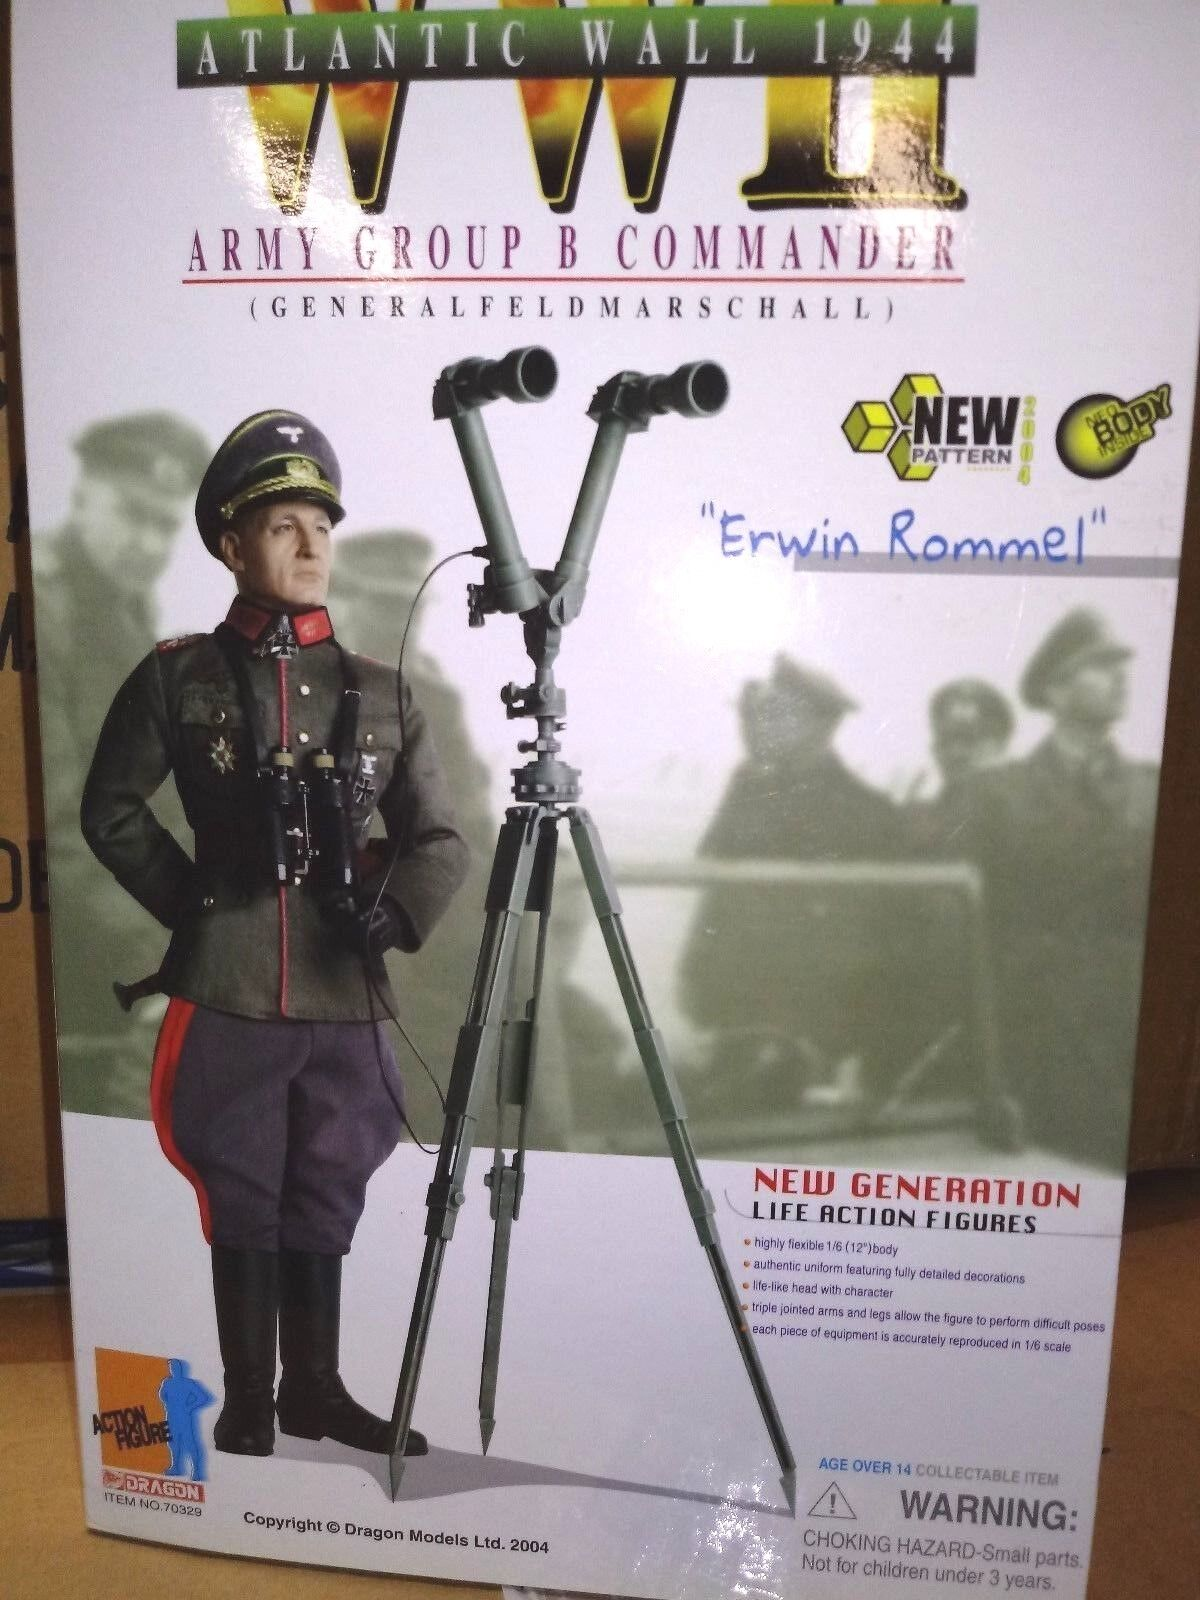 WW2 Feldmarschall  Erwin Rommel   1944 Europe 1/6